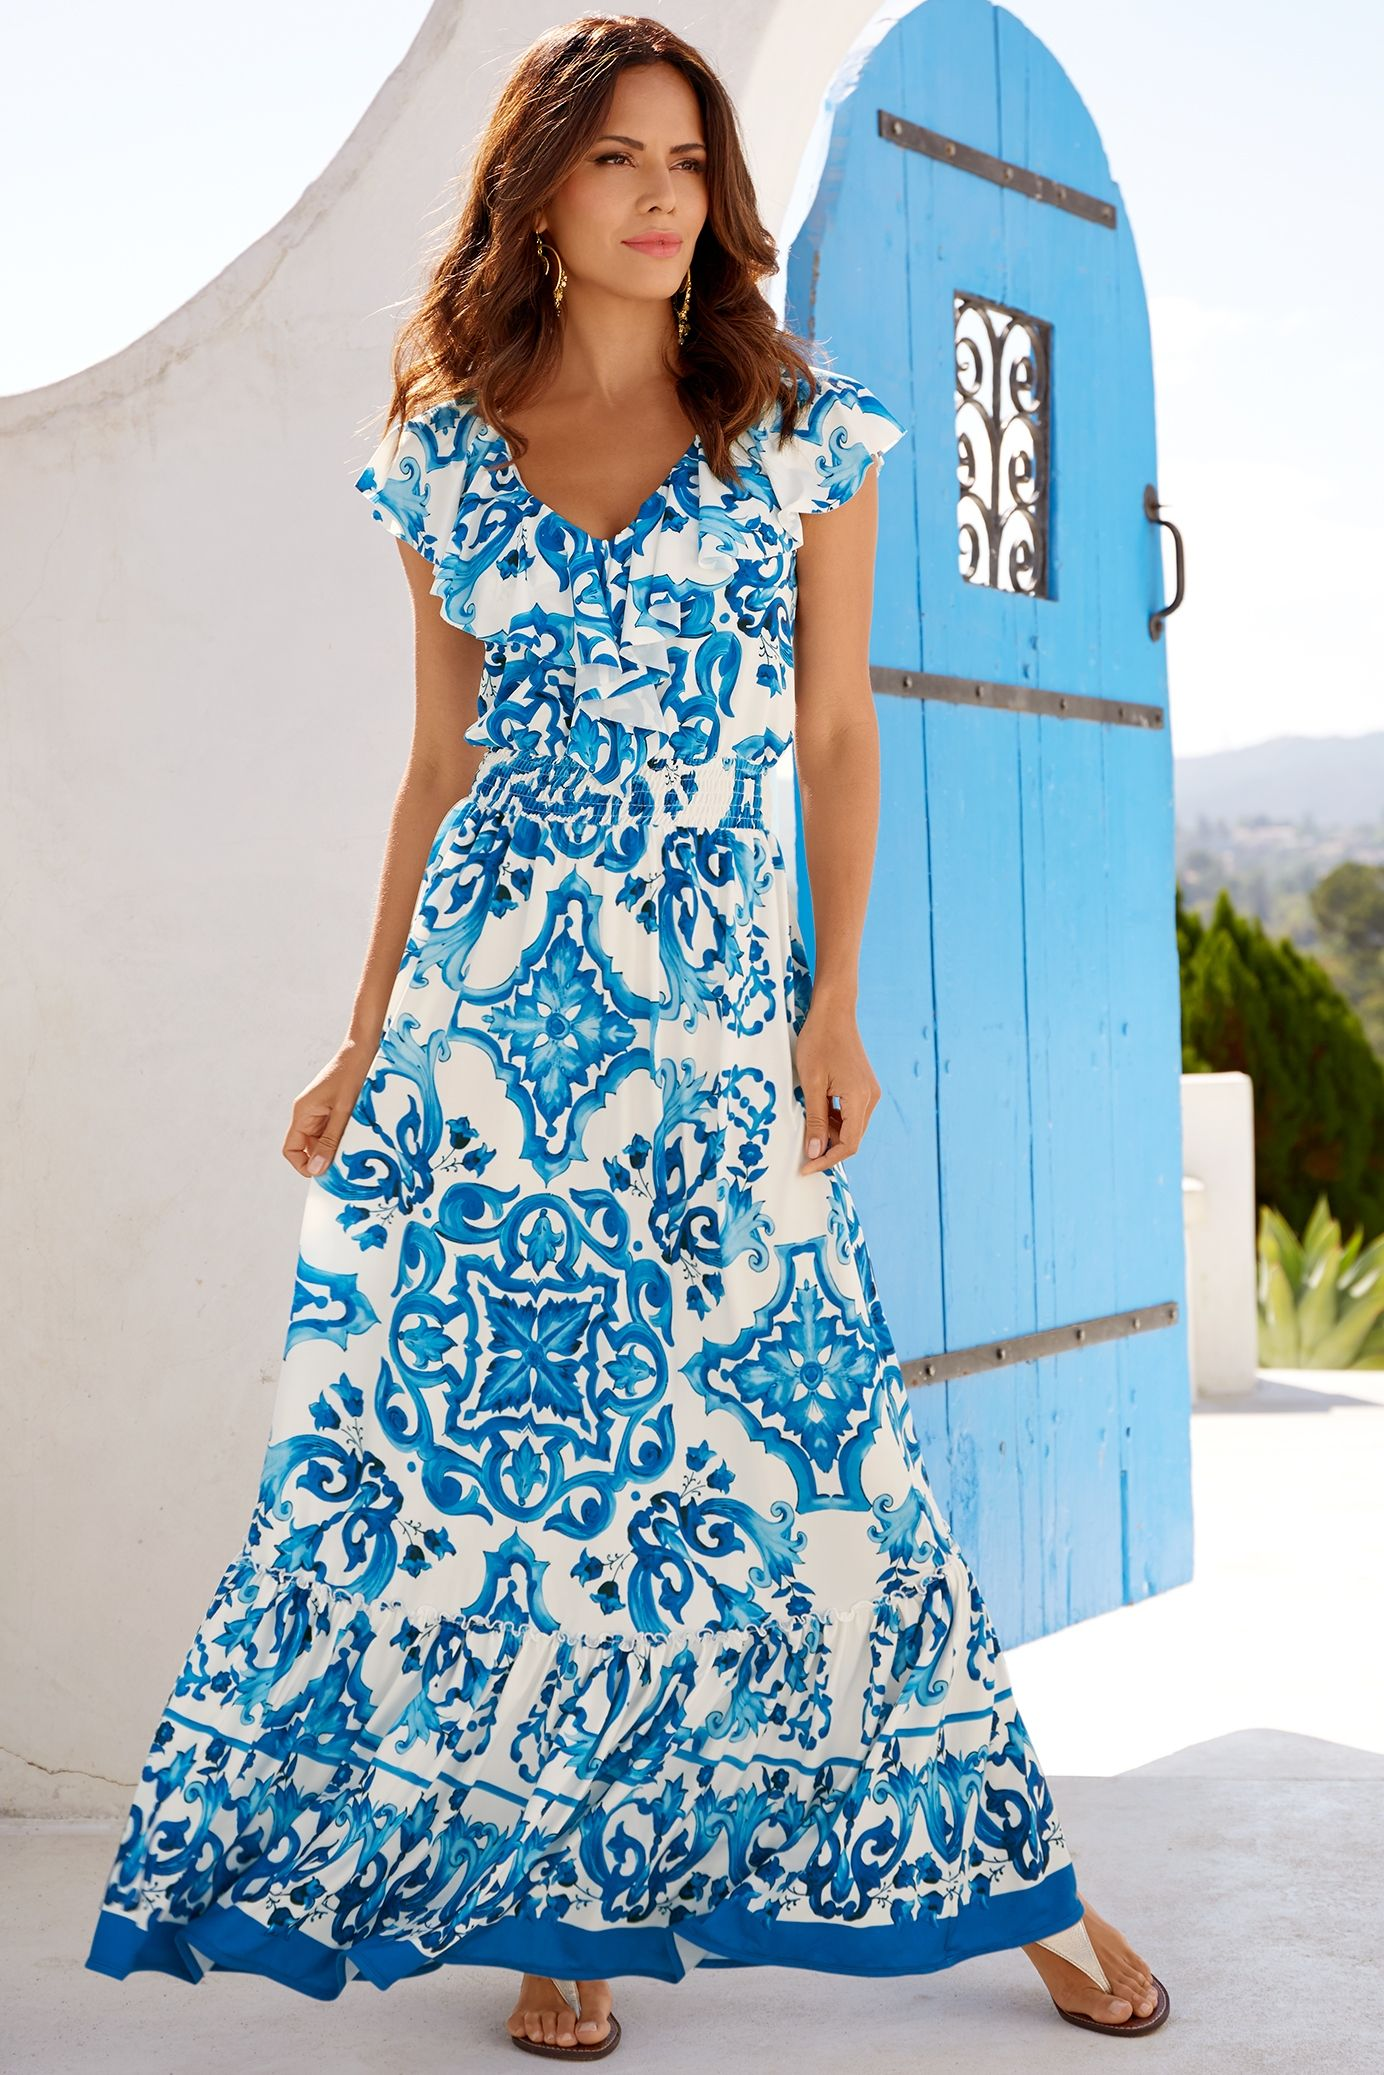 25958a2b49c8 Blue Tile Maxi Dress | Spring And Summer Fashion | Dresses, Resort ...